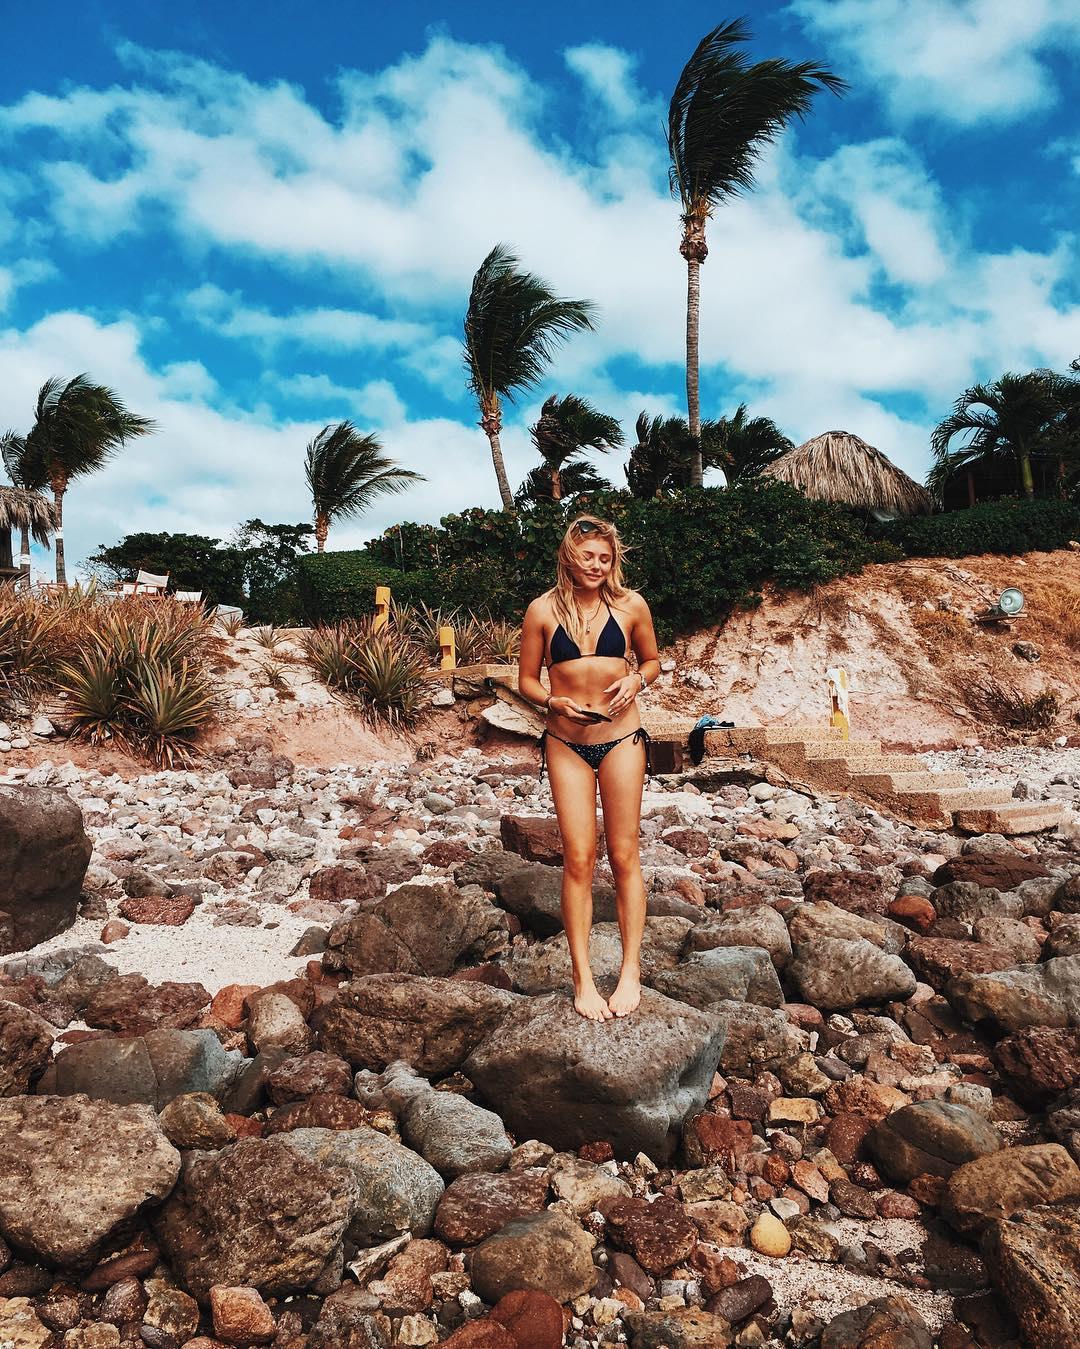 Chloe-GraceMoretz-in-a-Bikini